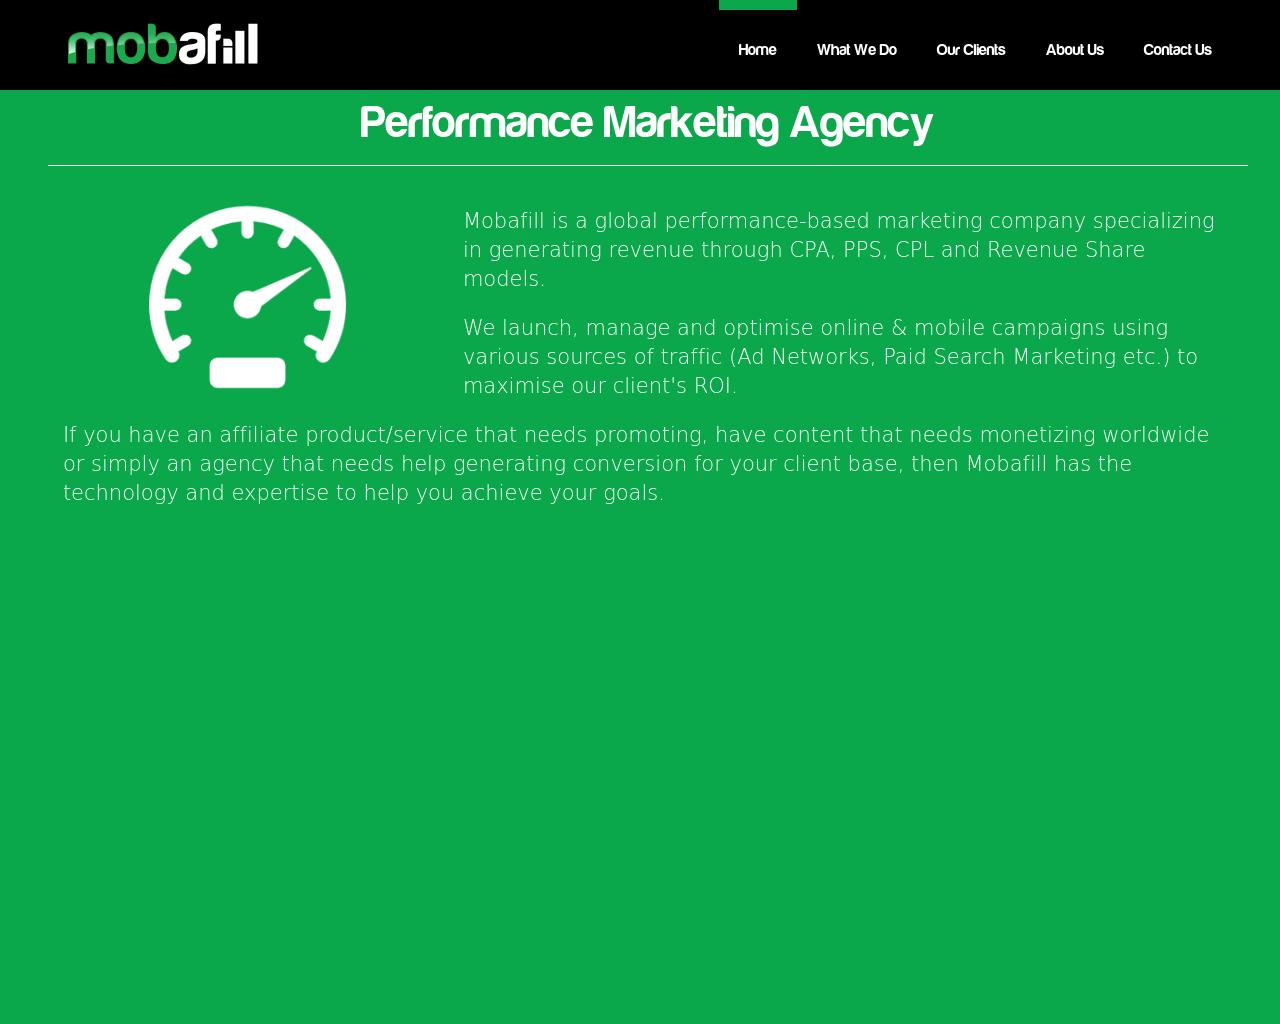 mobafill-Advertising-Reviews-Pricing